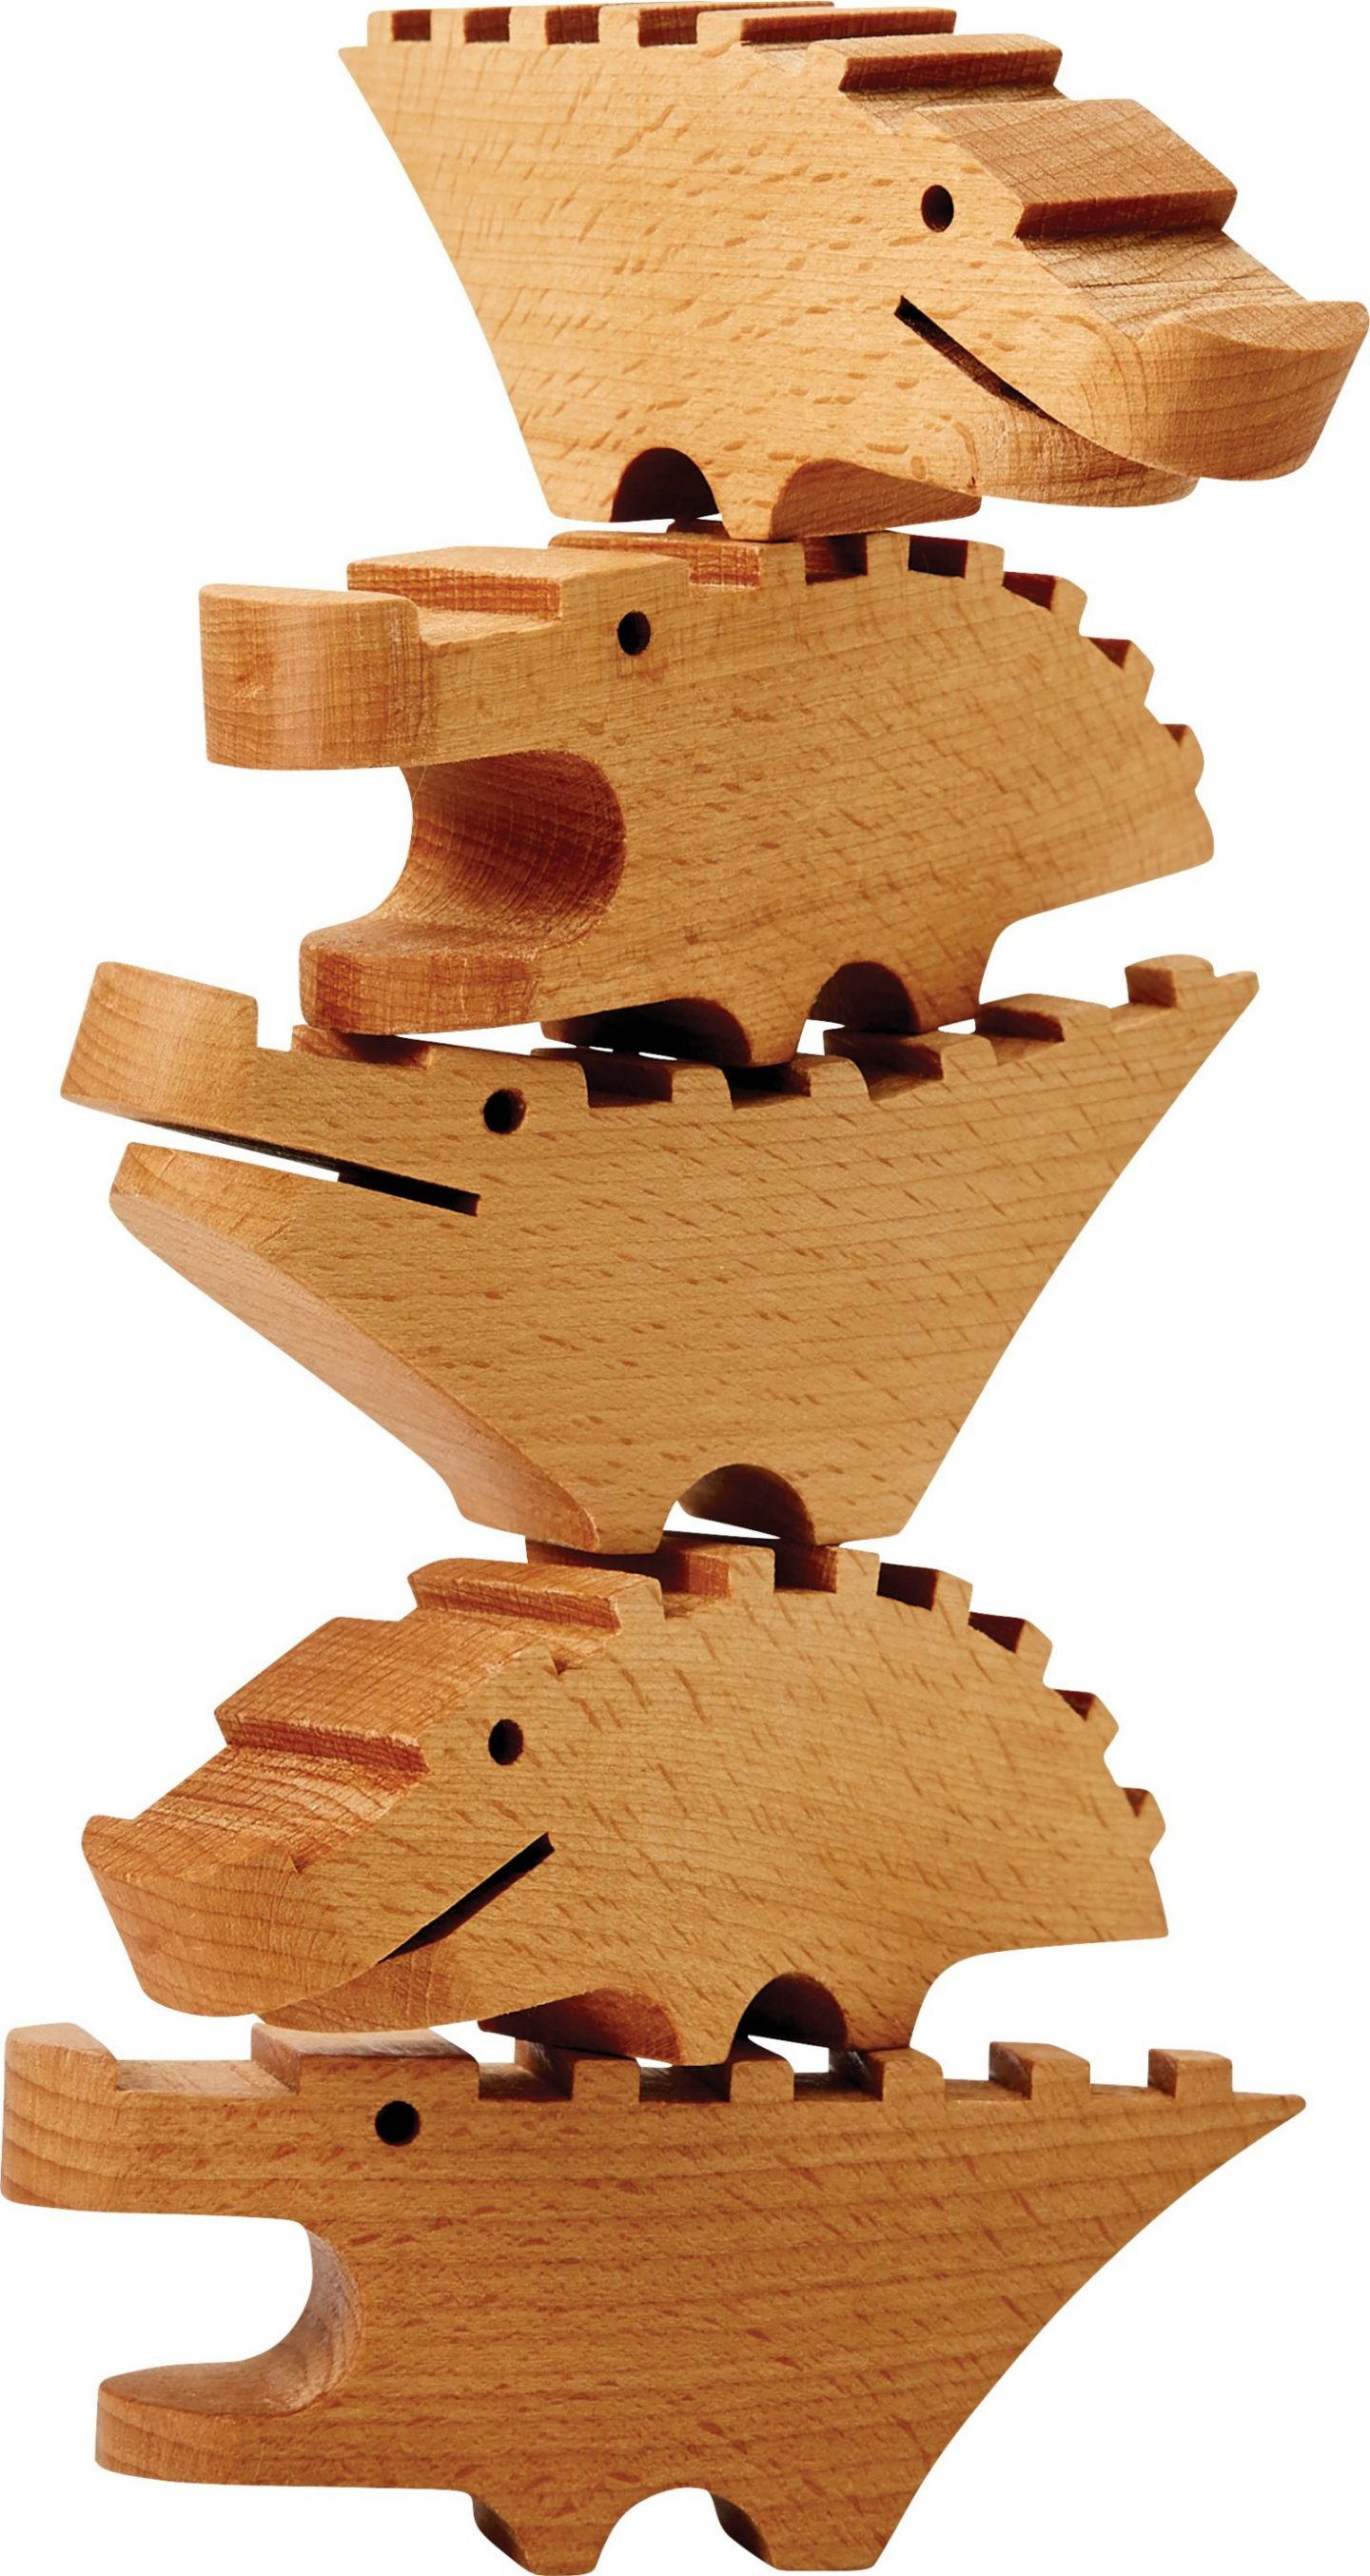 croc-pile-holz-stapelspiel